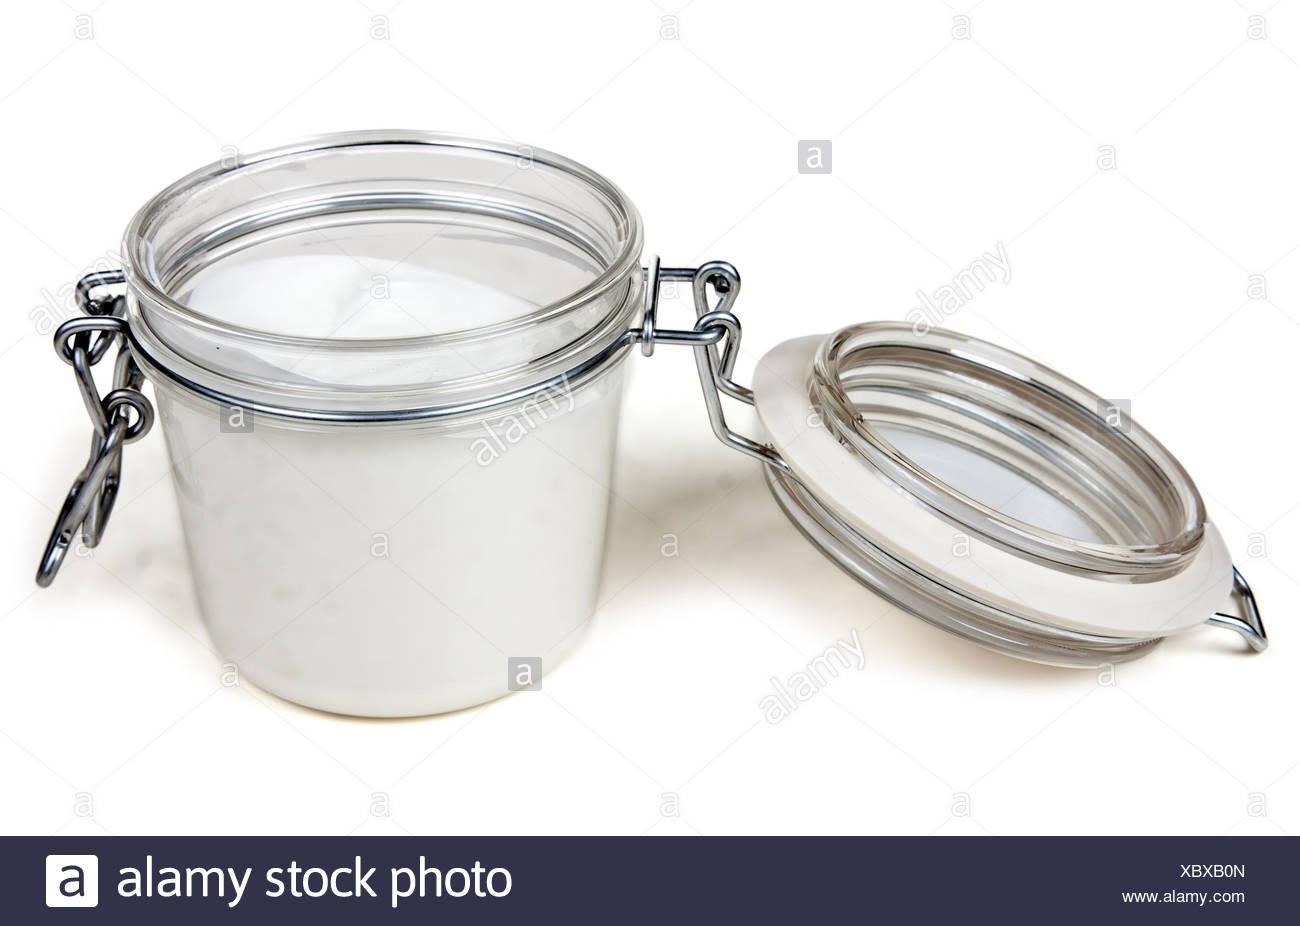 jar of cream with a steel lock Stock Photo: 282706501 - Alamy